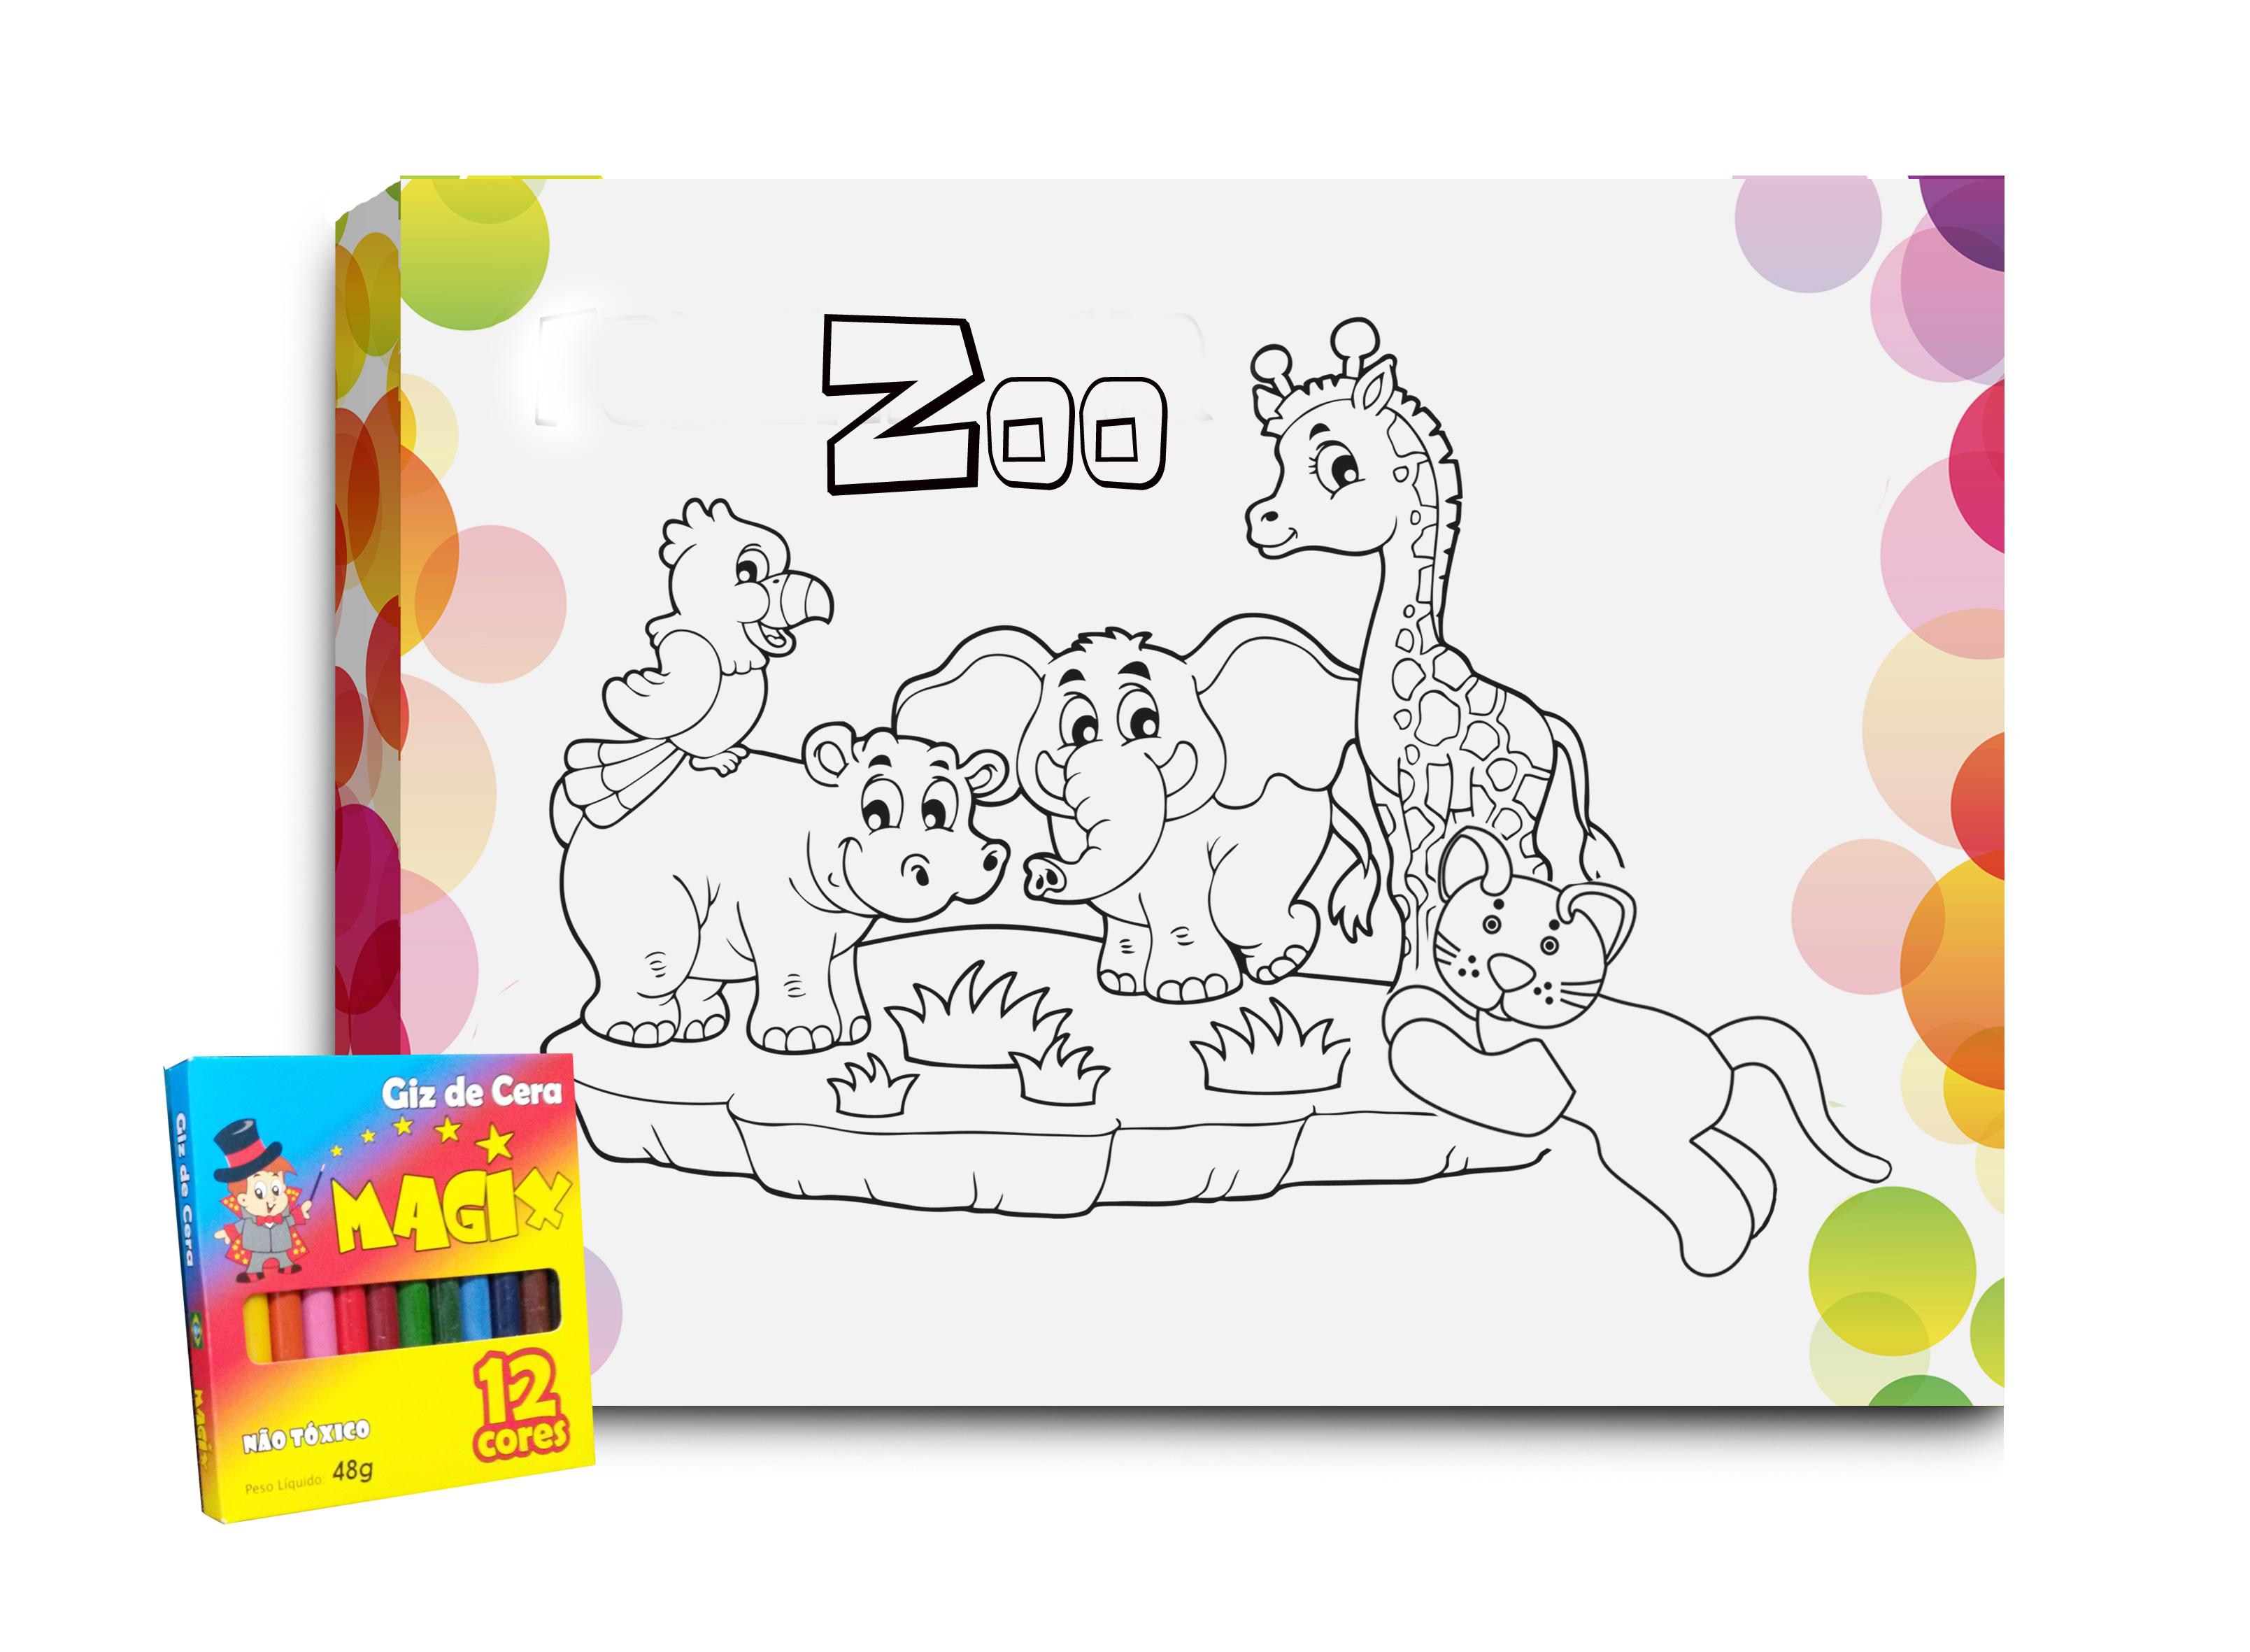 Quadro Para Colorir Zoologico No Elo7 Atelier Valverde 988c17